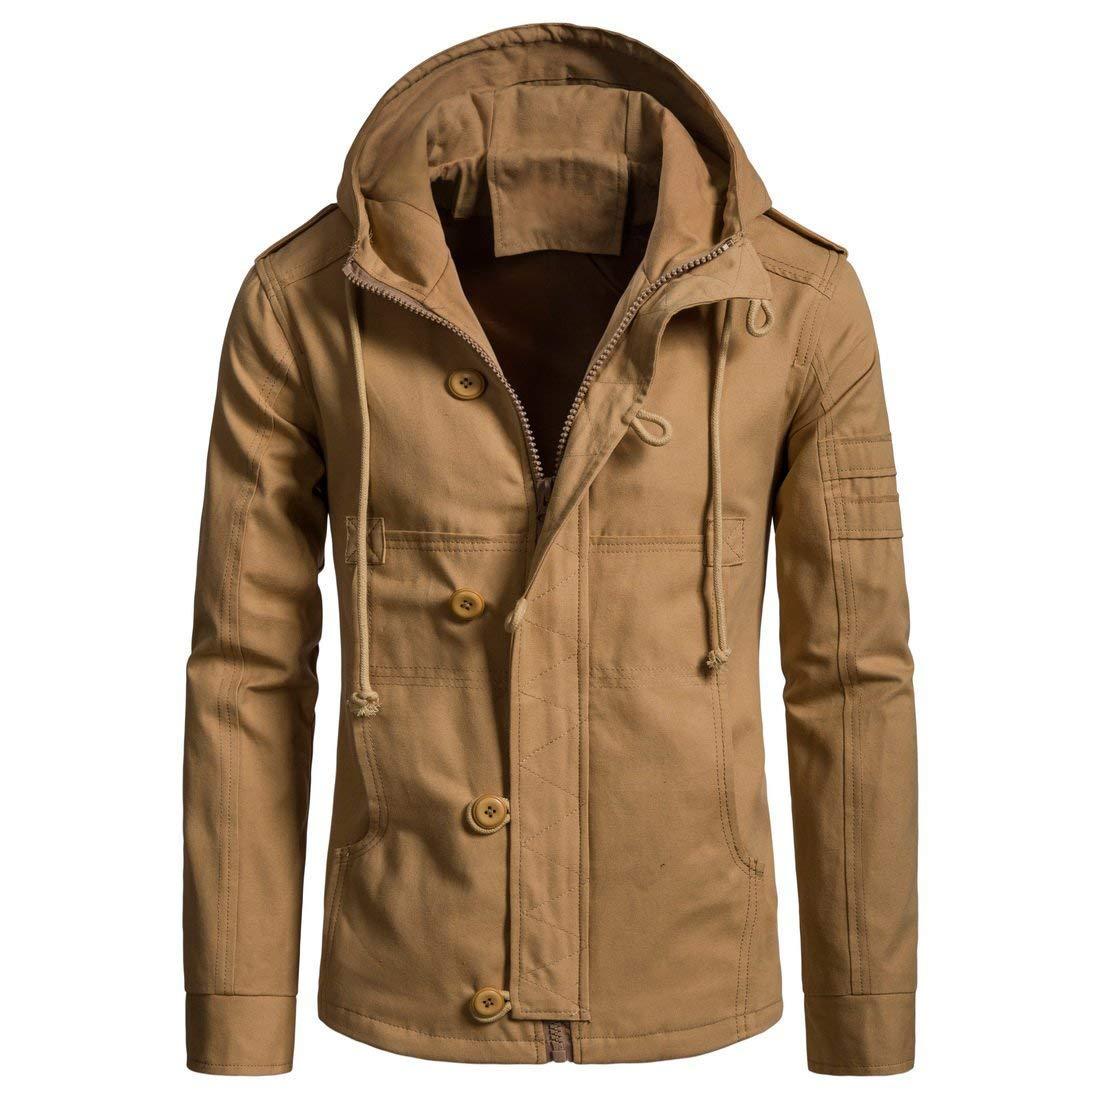 WEEN CHARM Men's Cotton Lightweight Zip Up Hooded Jacket Windbreaker Army Anorak Parka Hoodie Jacket with Drawstring